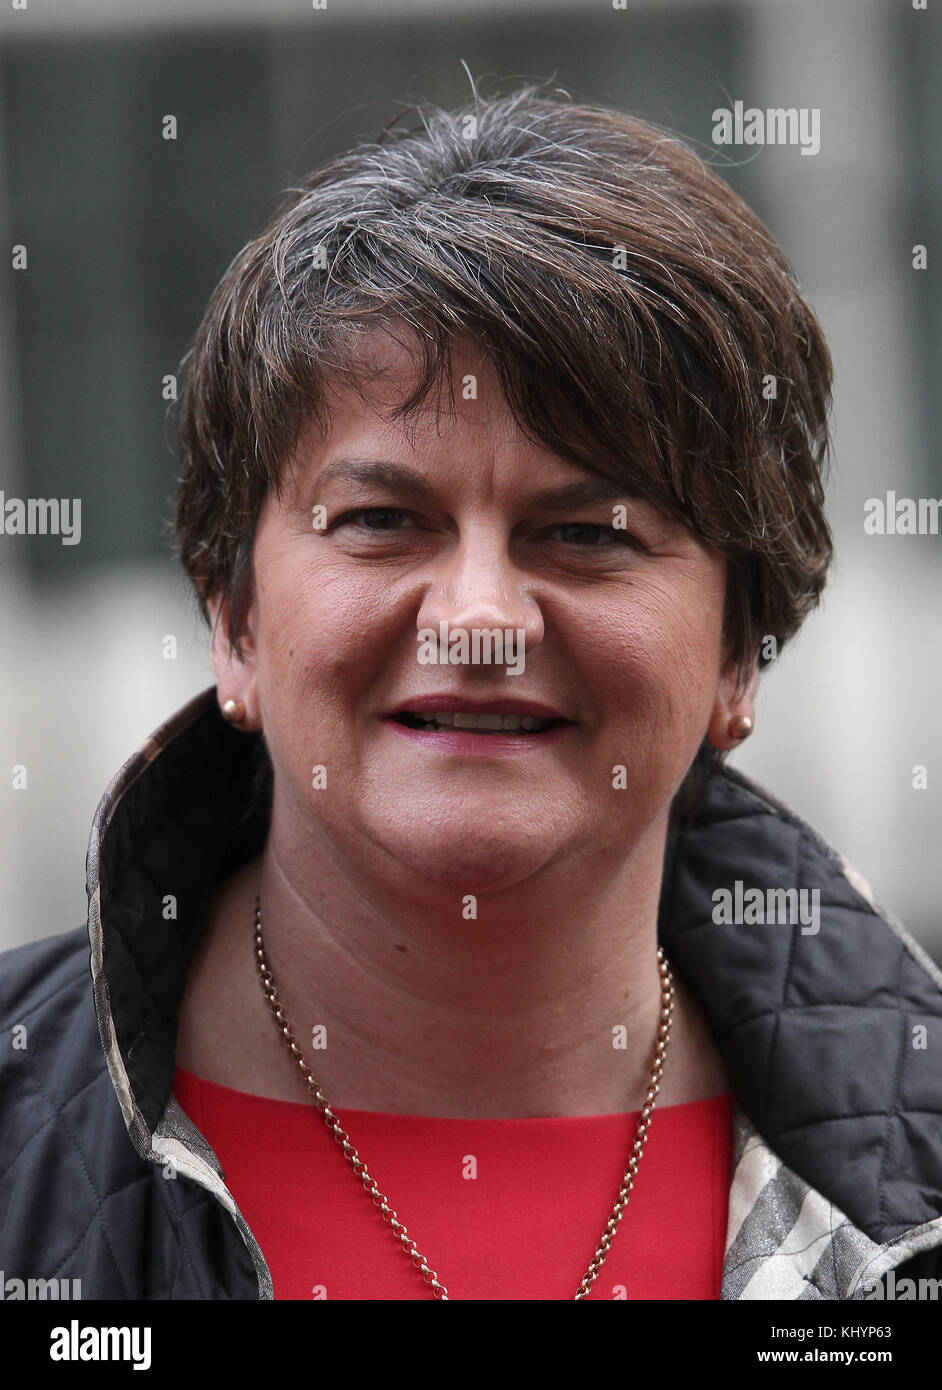 London, UK. 21st November, 2017. DUP Leader Arlene Foster seen leaving 10 Downing Street in London Credit: RM Press/Alamy - Stock Image